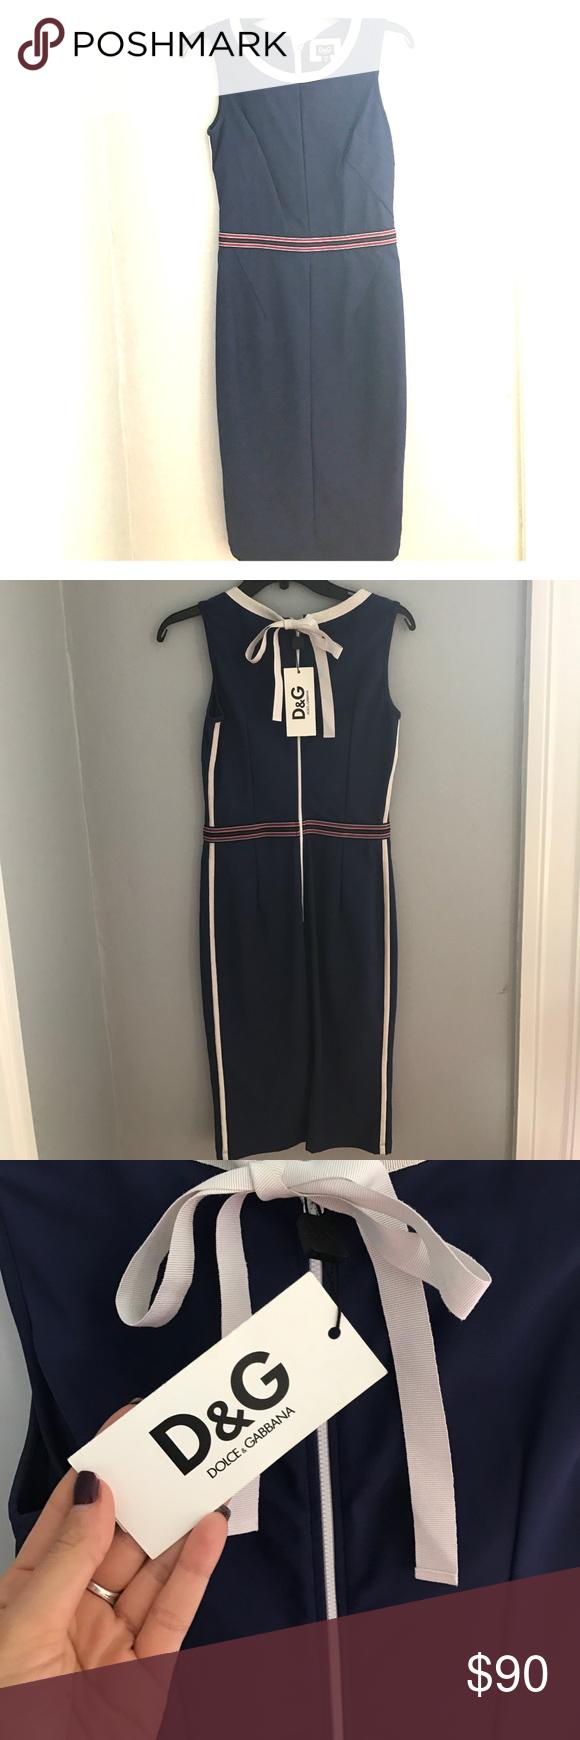 Dolce & Gabbana Nautical Dress Beautiful D&G Blue Slim Sport Dress. European size 40; US 8 equivalent. Never worn. New with tags. Dolce & Gabbana Dresses Midi